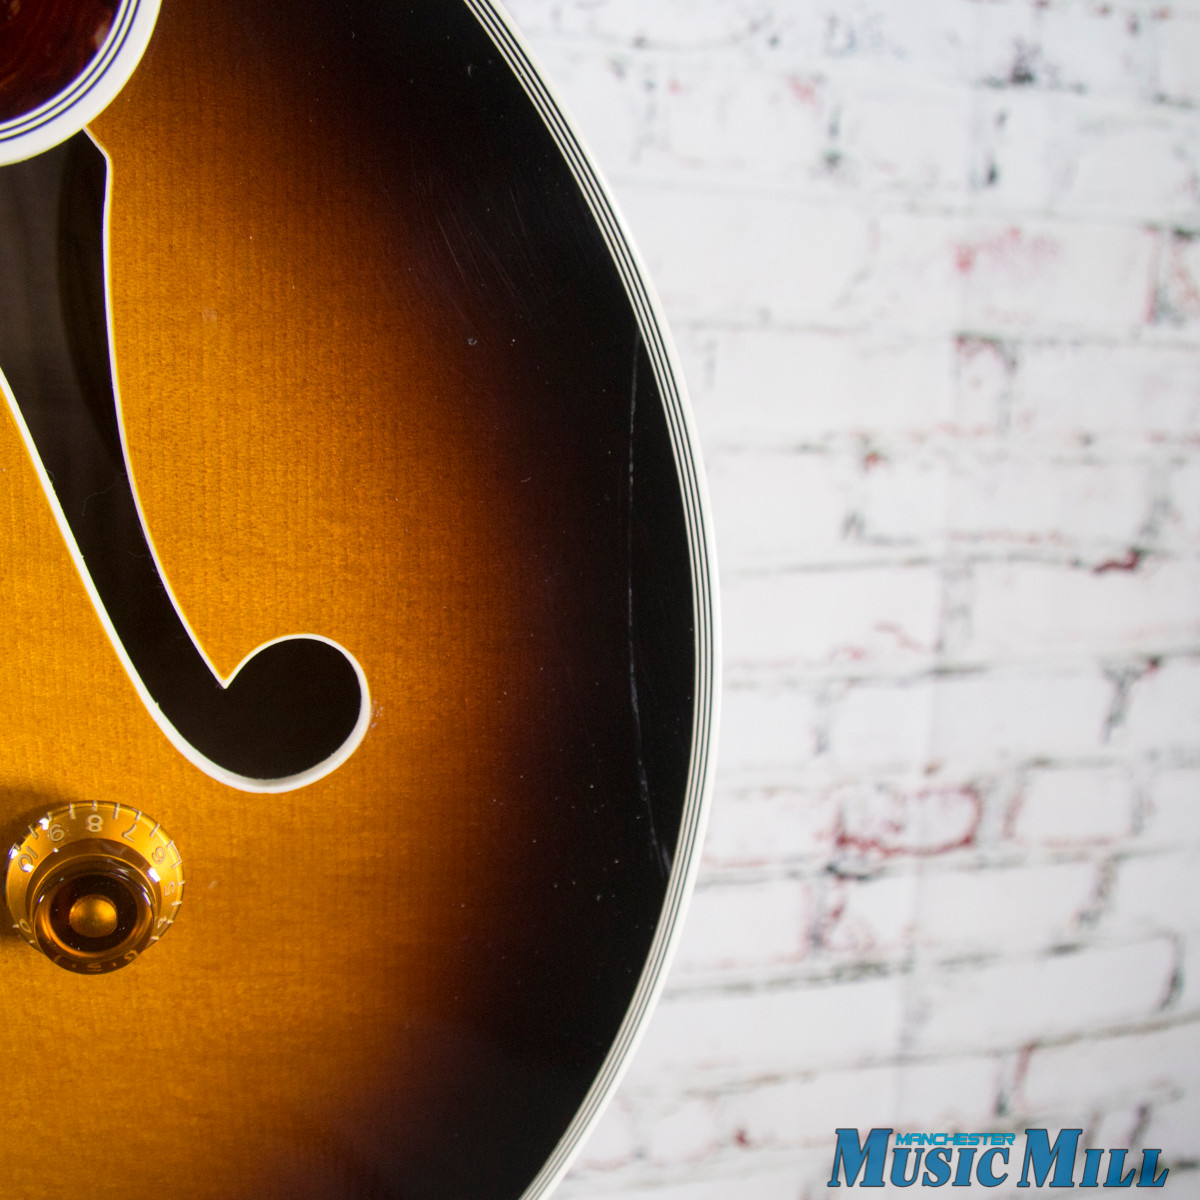 1992 Gibson L-5 Custom Wes Montgomery Hollowbody Electric Guitar Vintage Sunburst